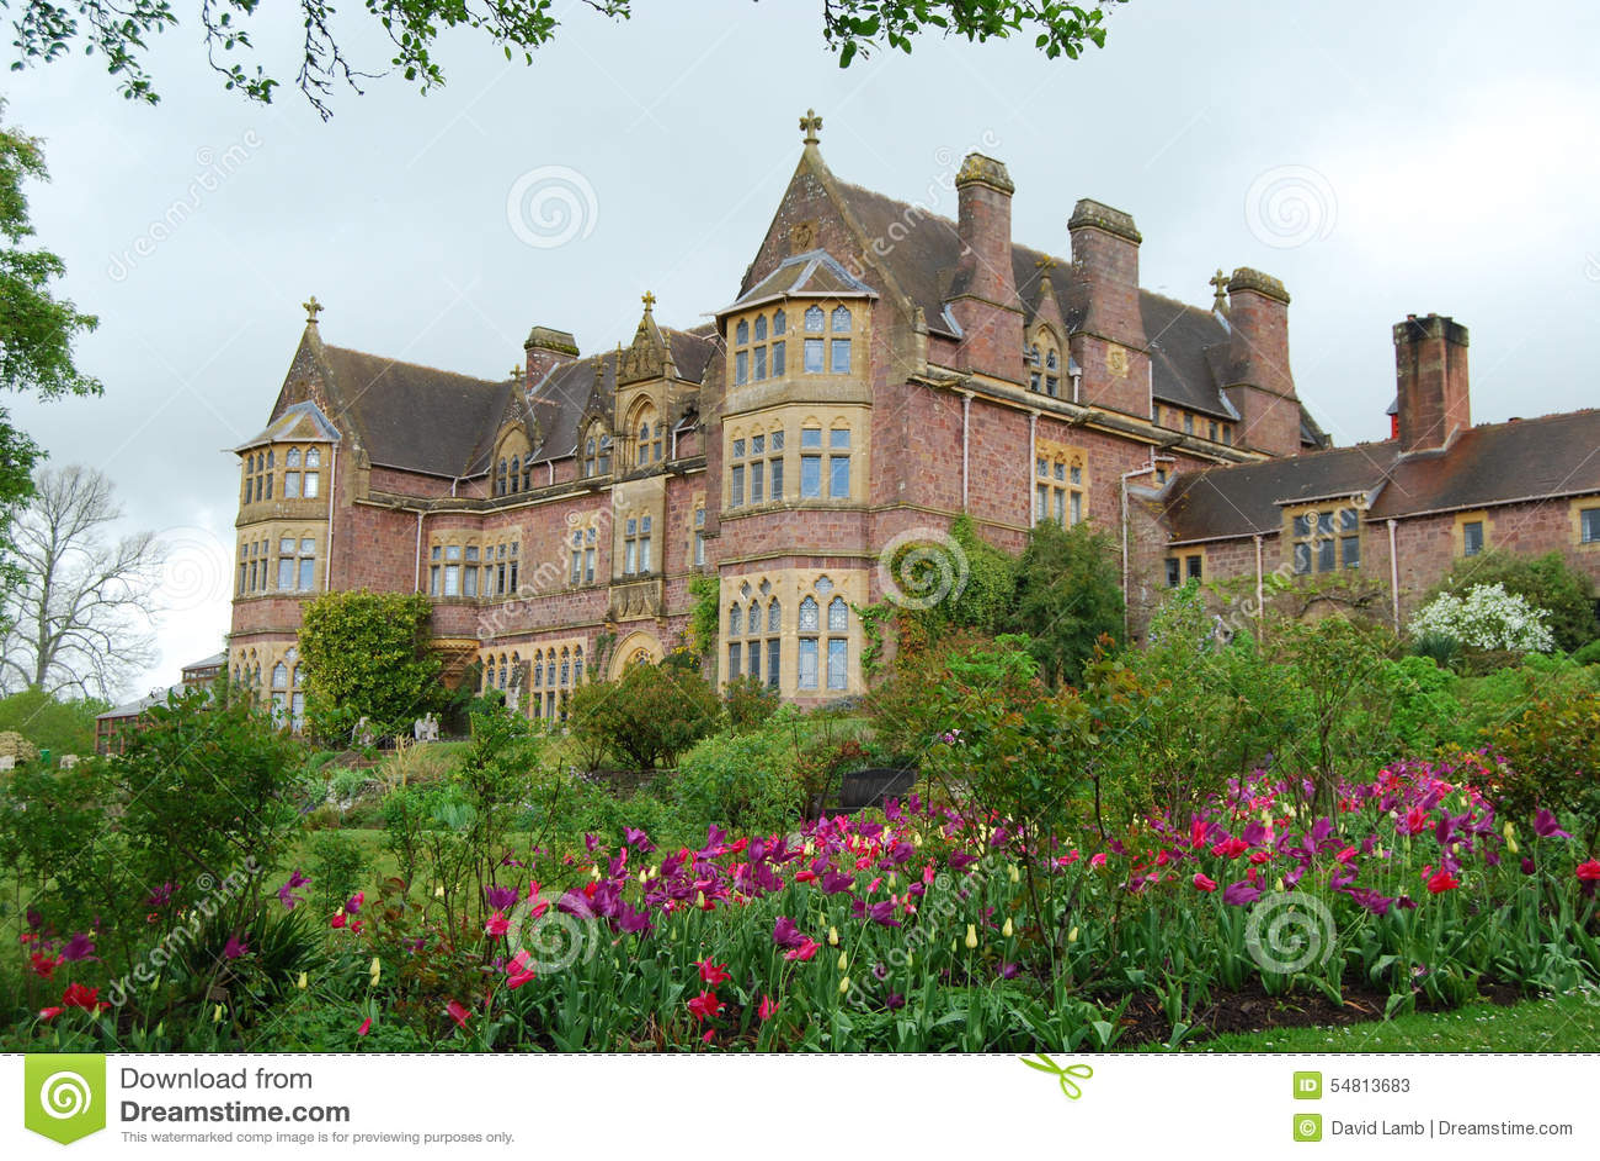 Maison de campagne anglaise devon photo stock image for Maison anglaise typique plan